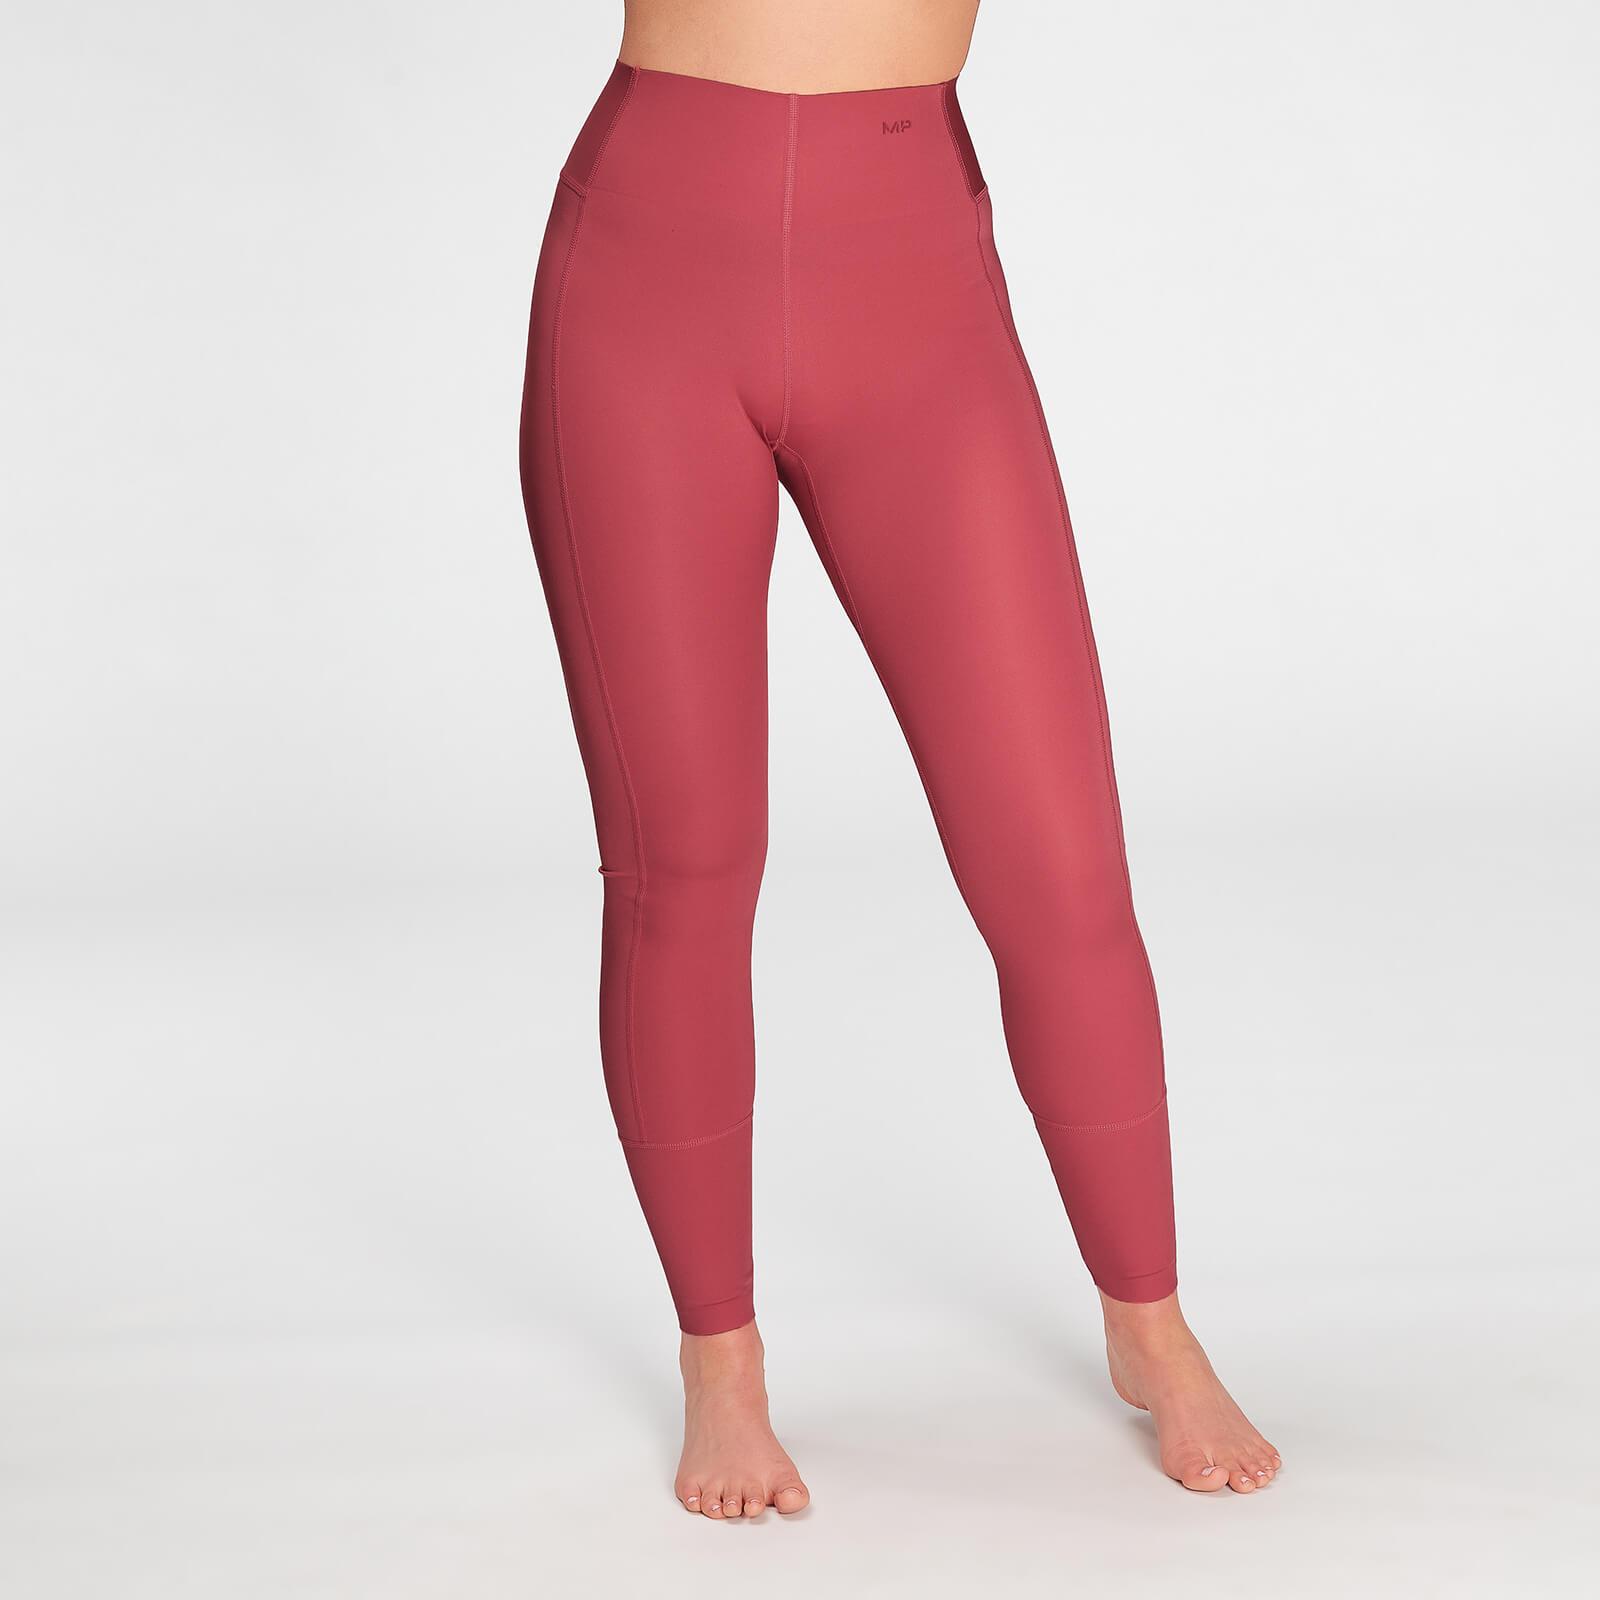 Купить MP Women's Composure Leggings- Berry Pink - XXS, Myprotein International